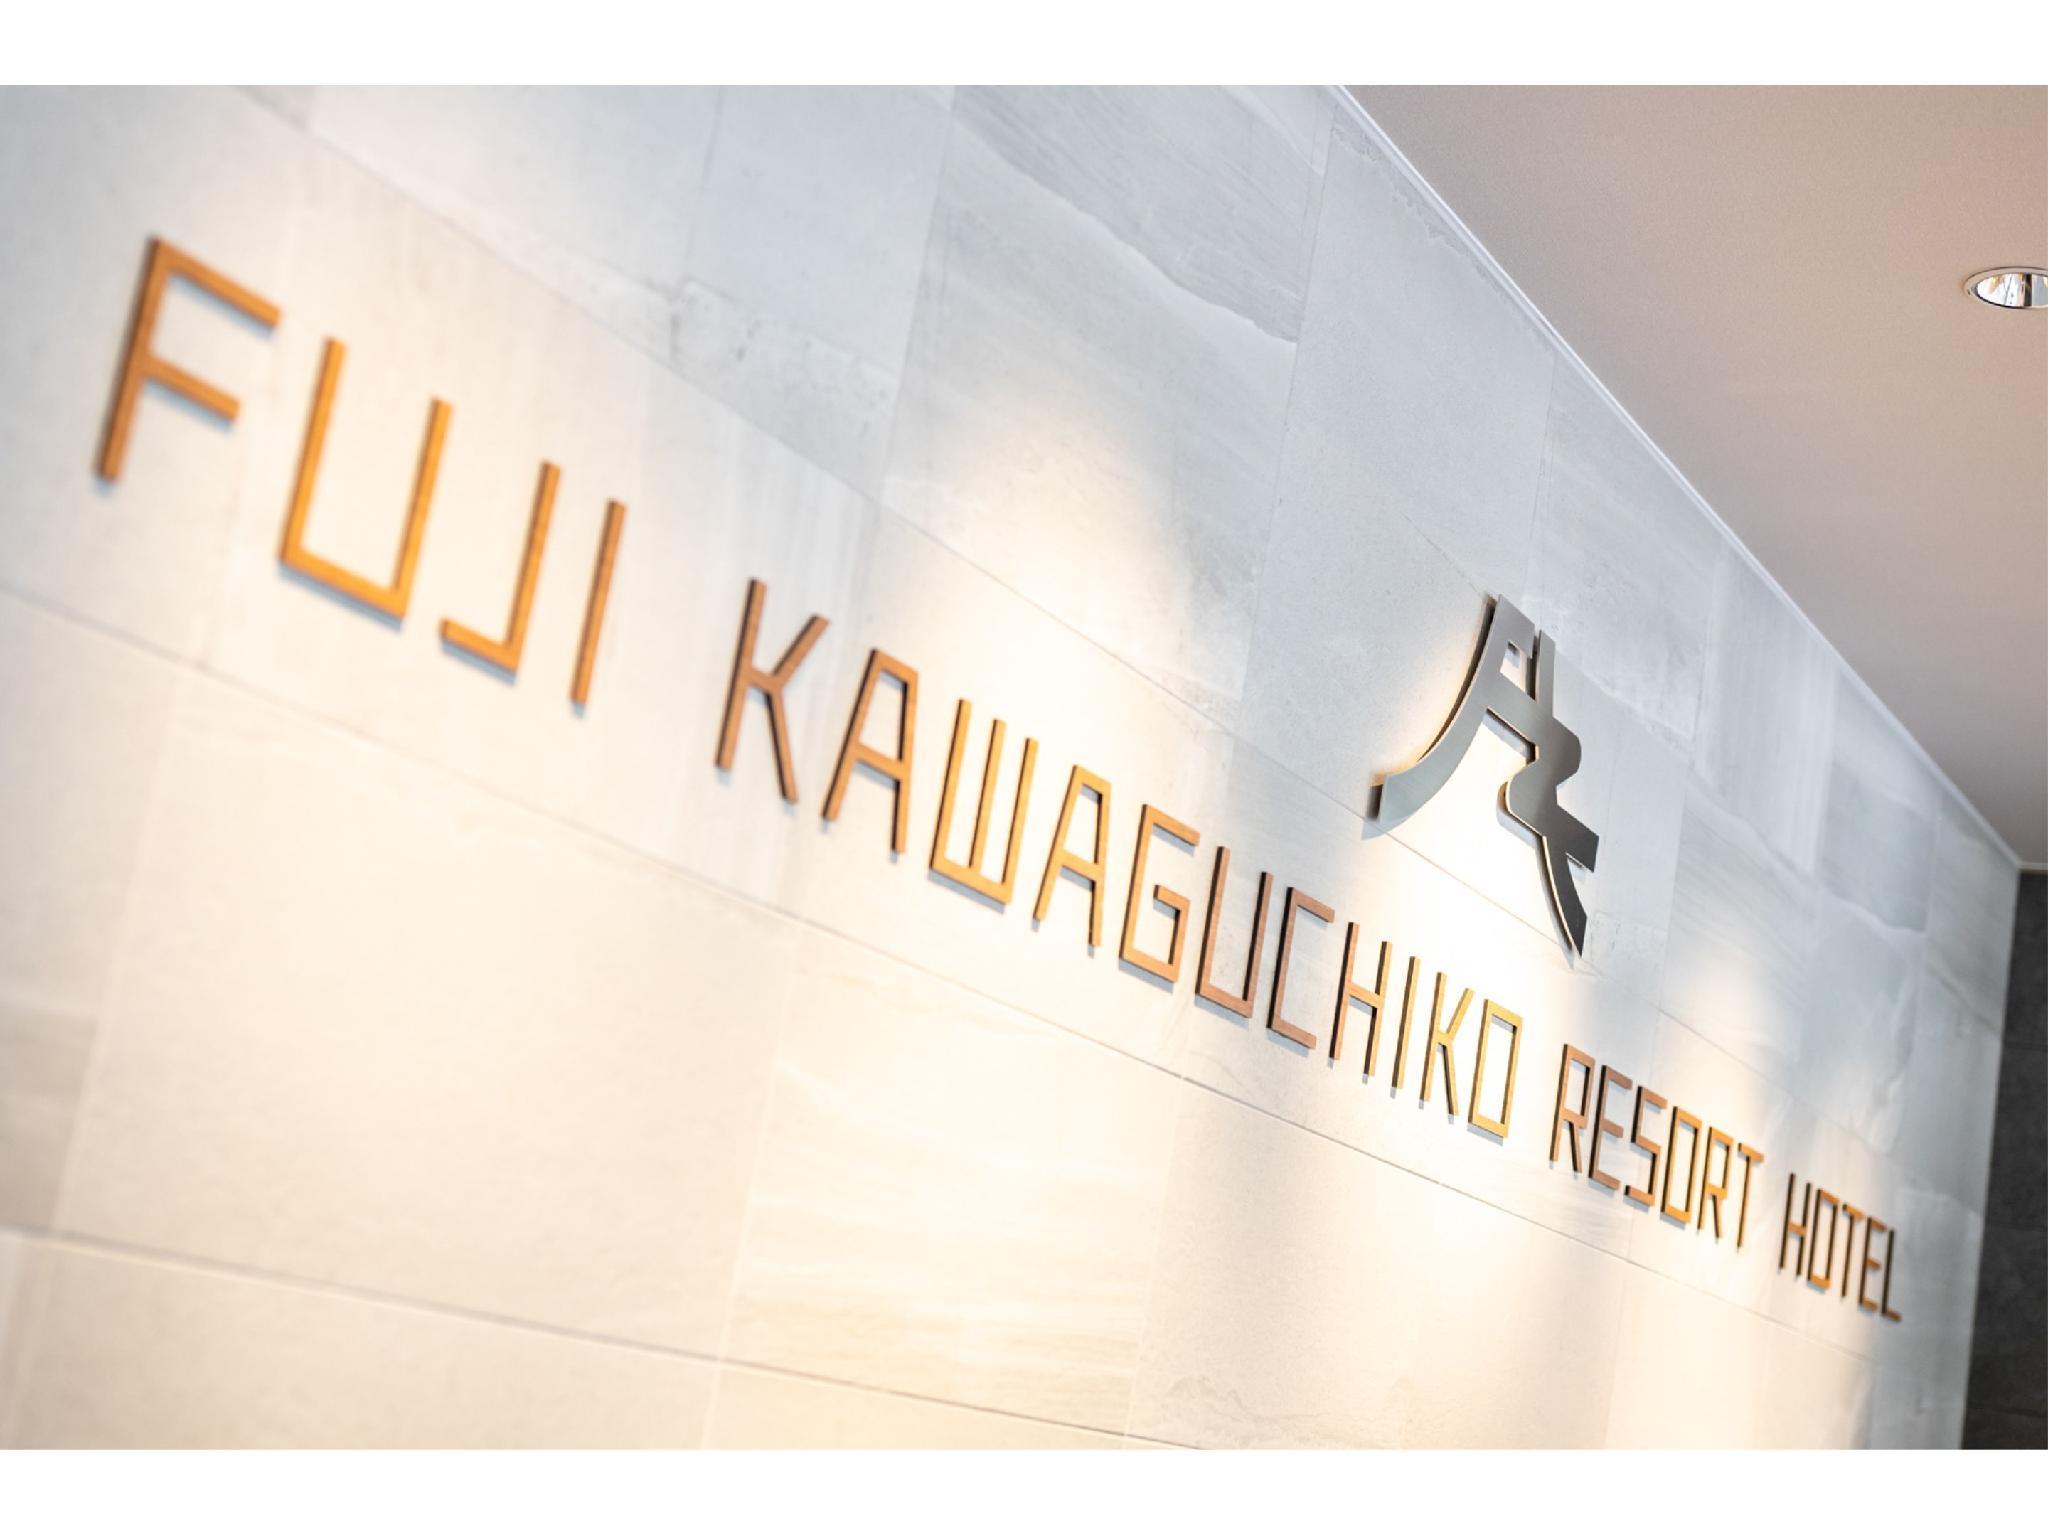 Fuji Kawaguchiko Resort Hotel